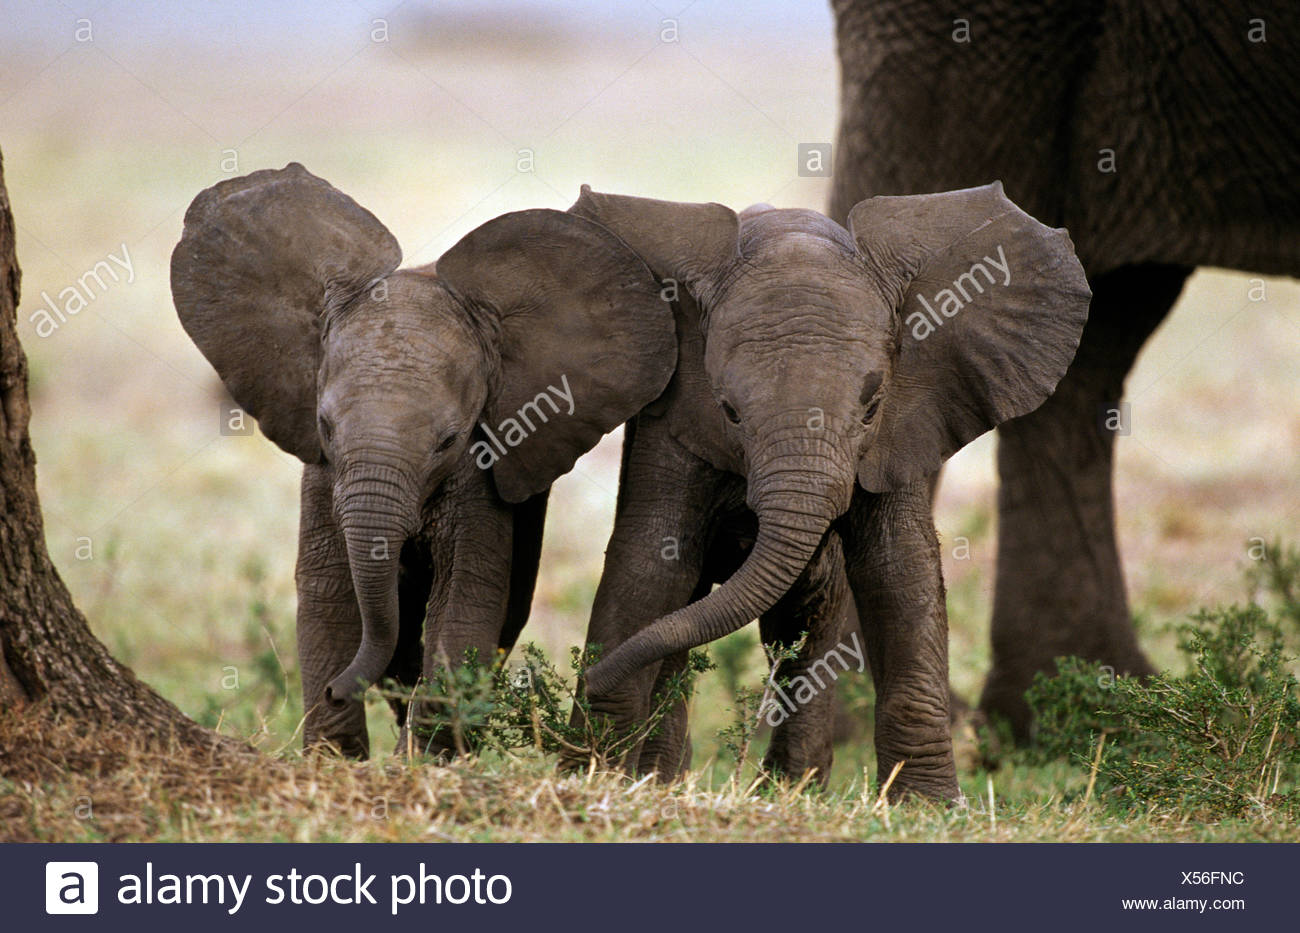 African elephant babies with large ears (Loxodonta africana) Masai Mara NR, Kenya - Stock Image